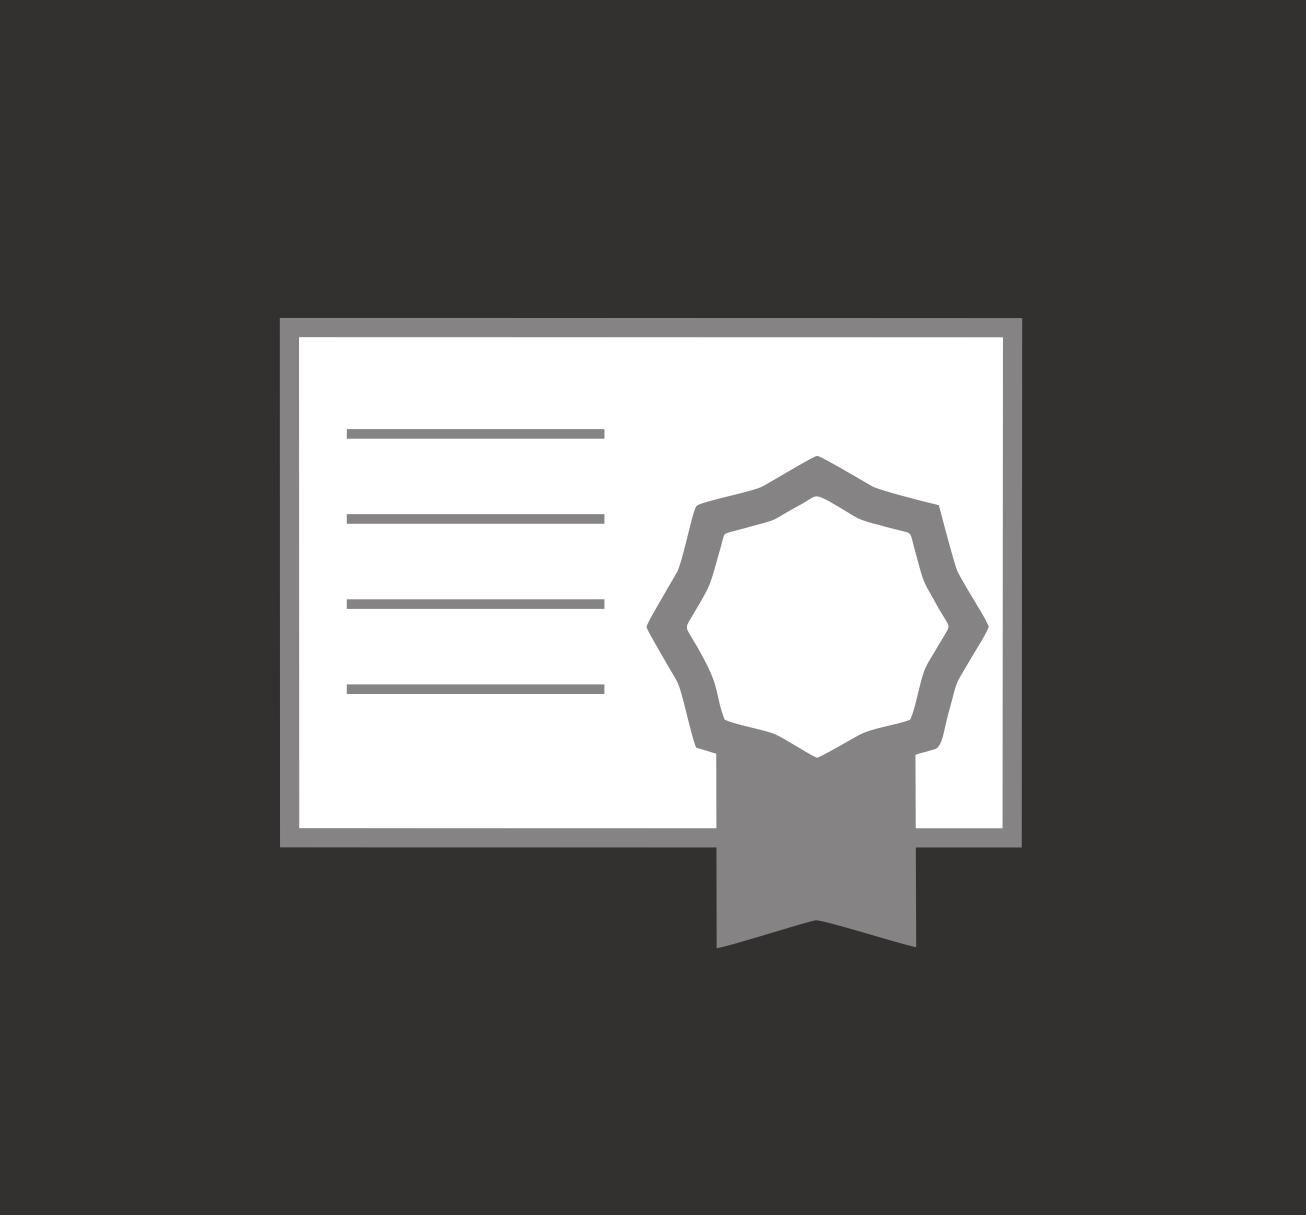 stock-vector-certificate-icon-flat-design-vector-illustration-256902796.jpg